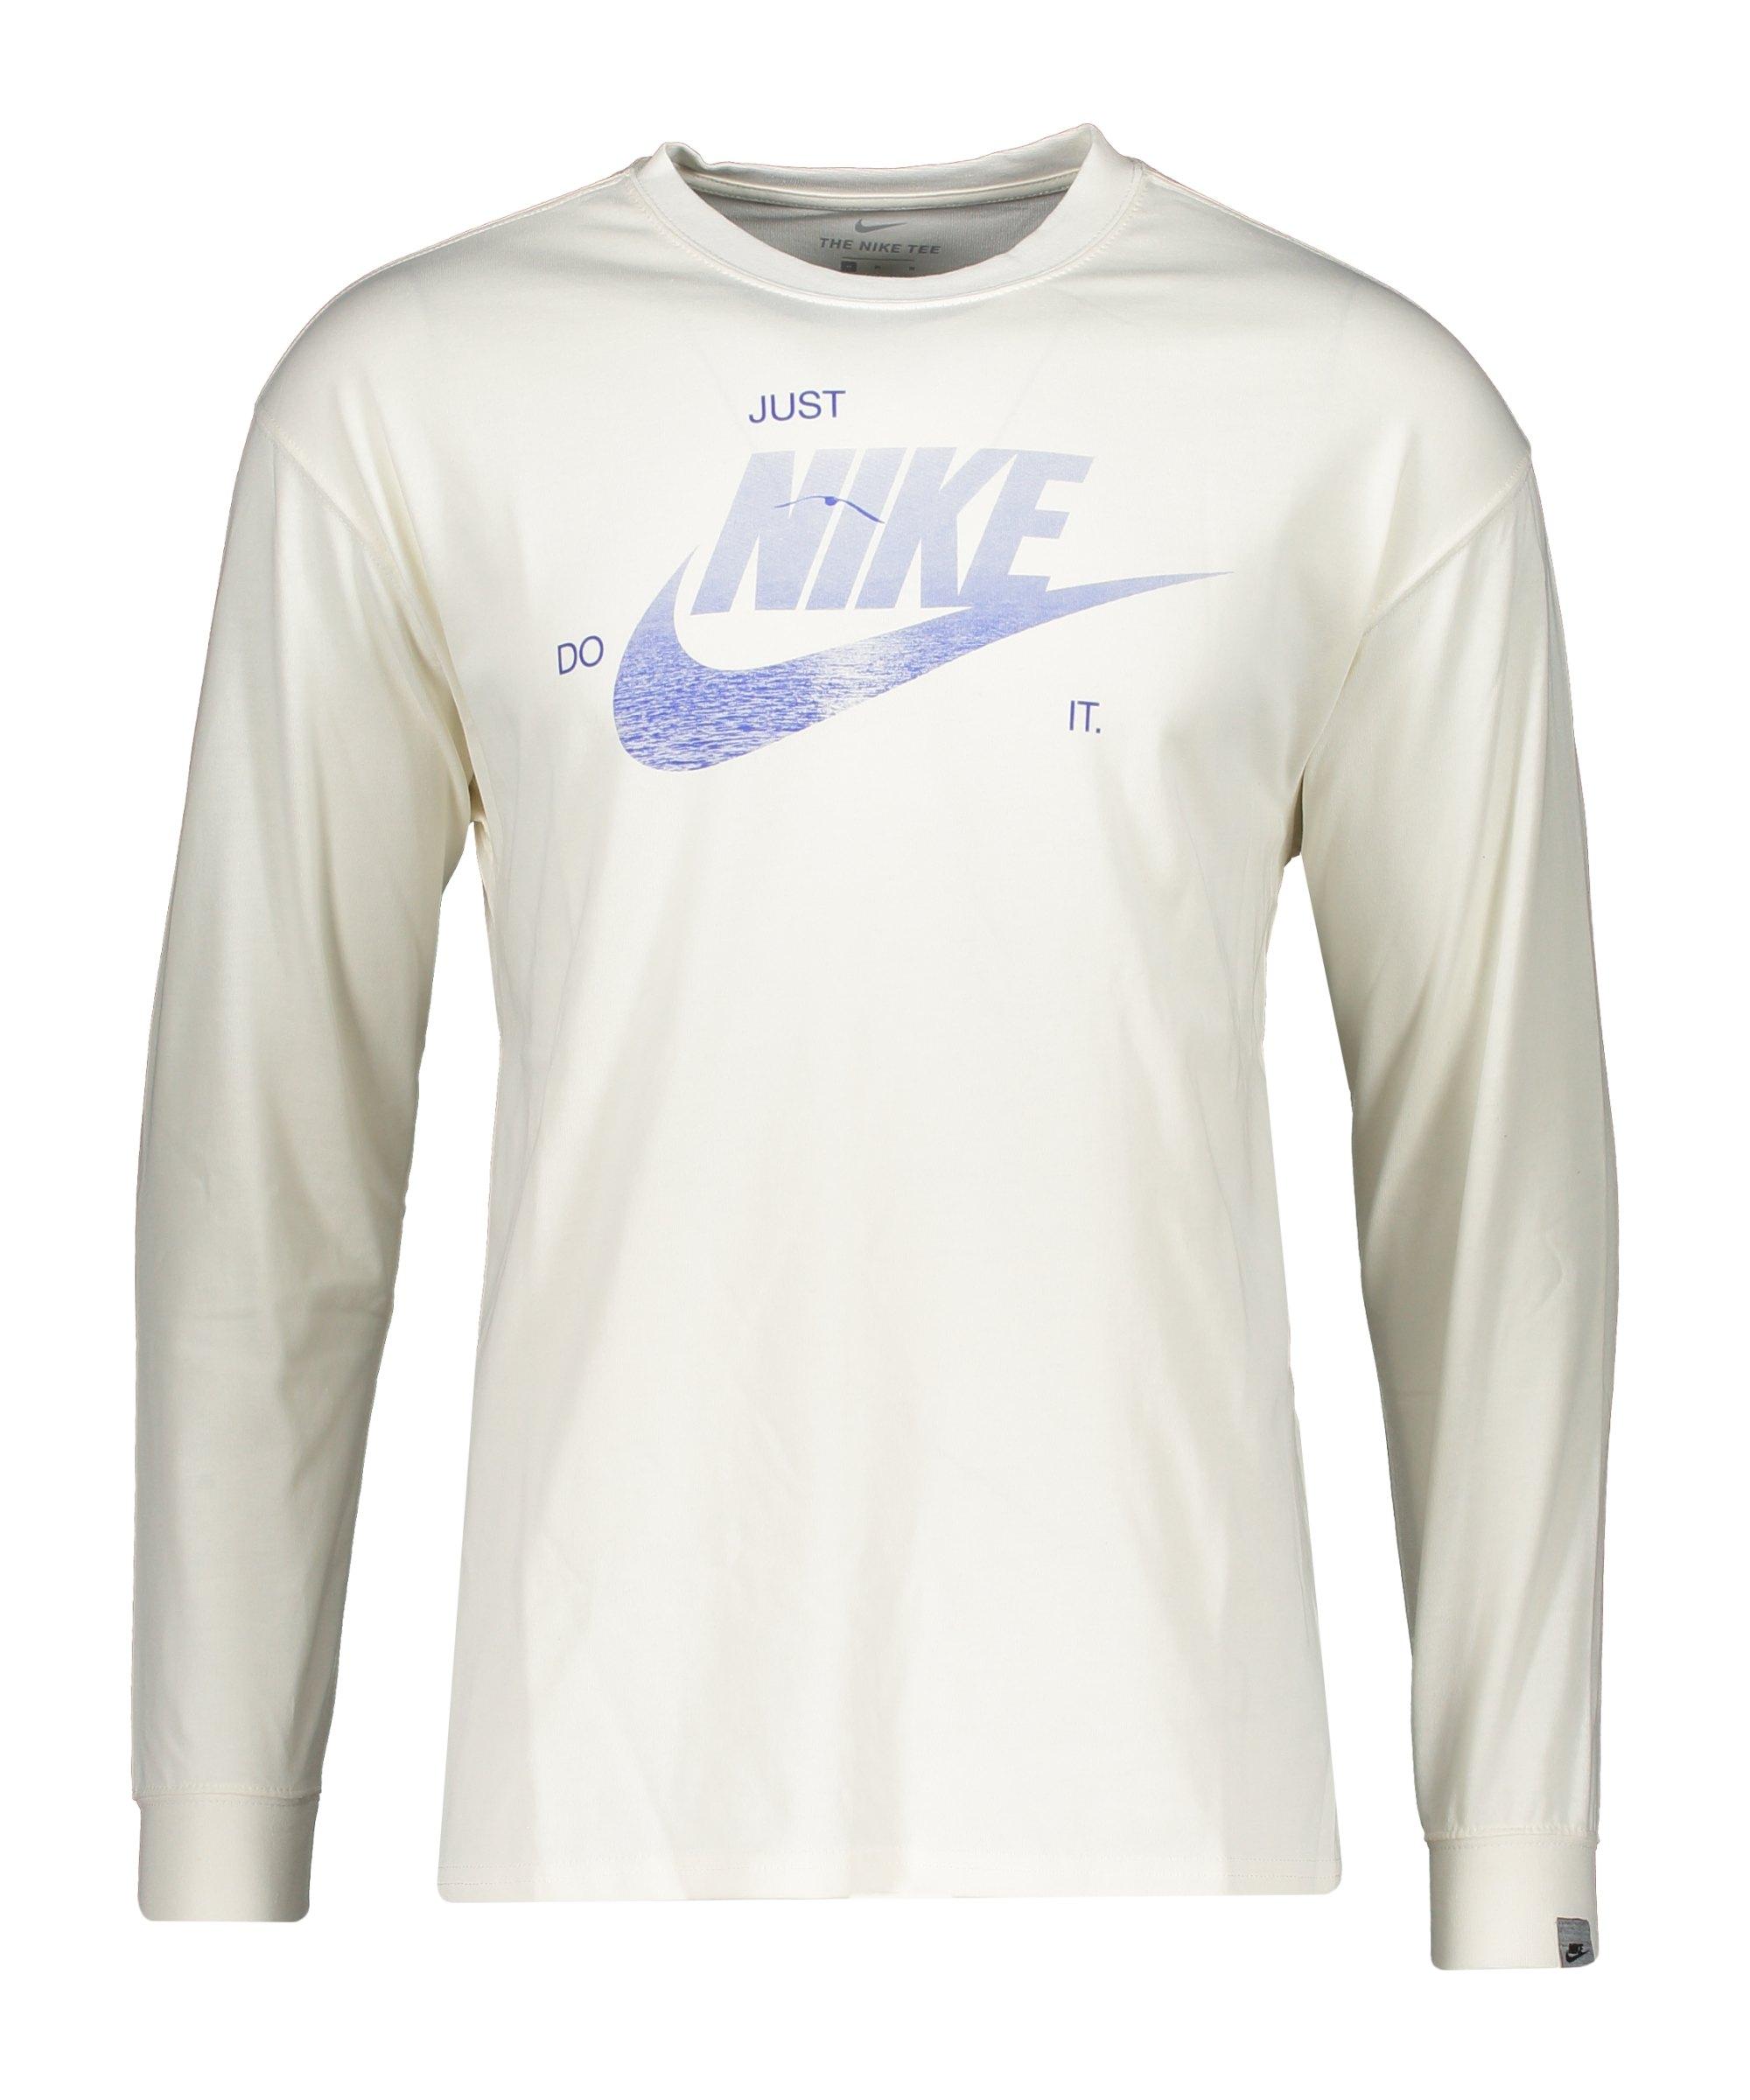 Nike Graphic Sweatshirt Weiss Blau F901 - weiss